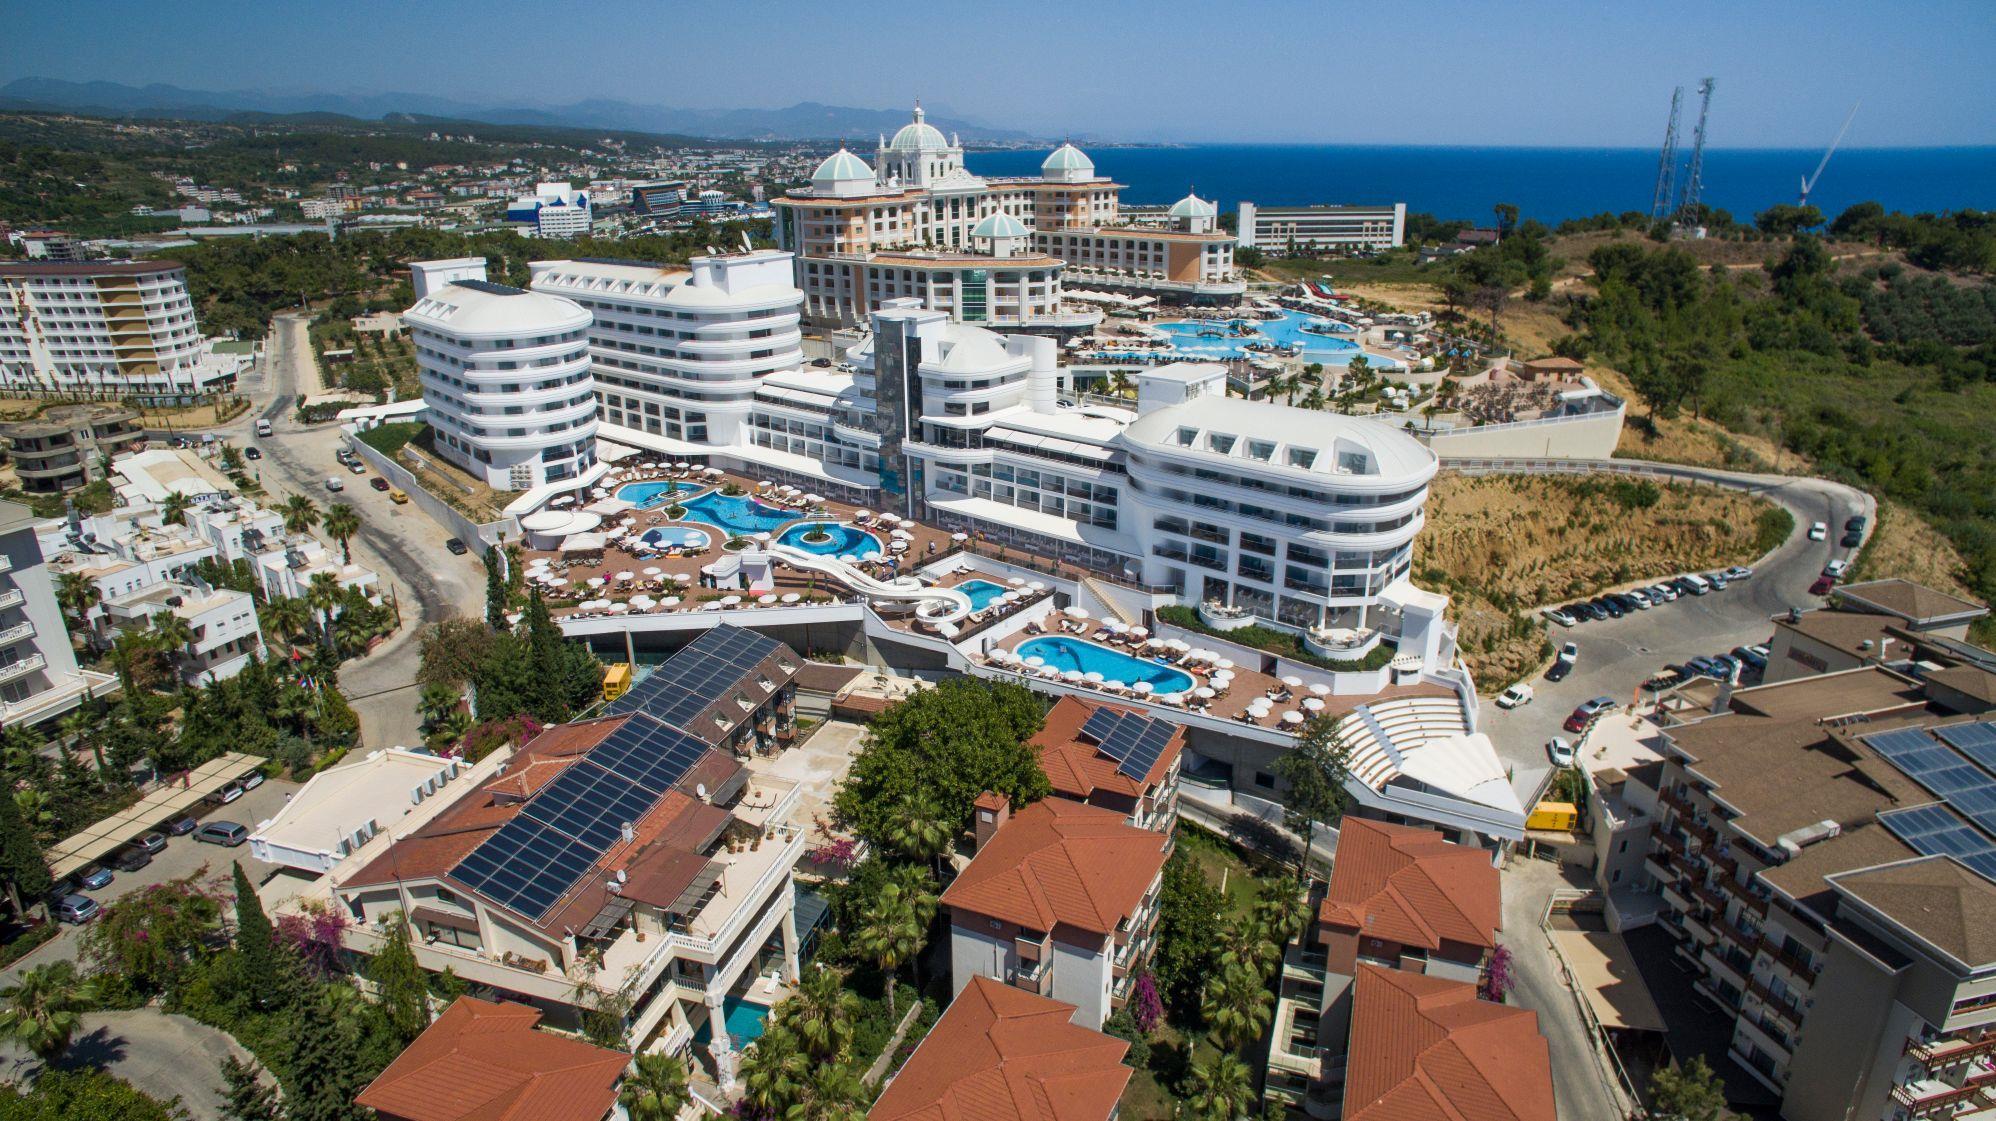 http://www.orextravel.sk/OREX/hotelphotos/laguna-beach-alya-general-0014.jpg